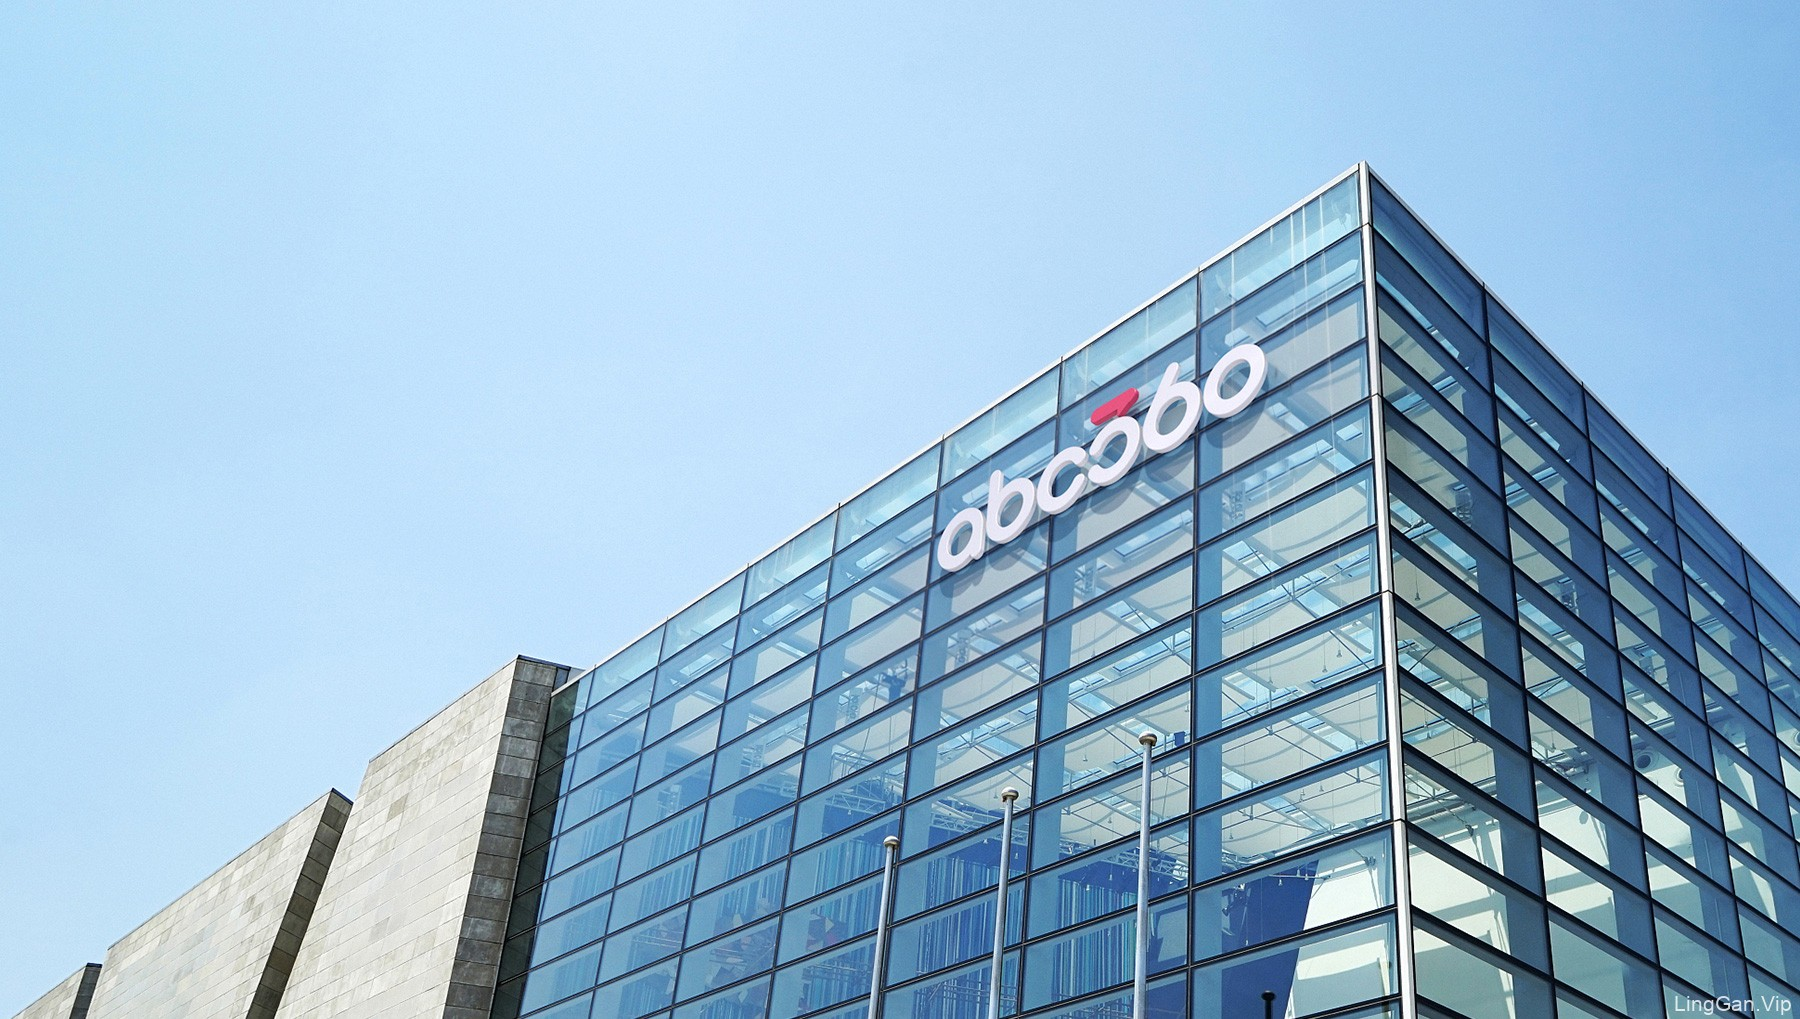 abc360启用全新品牌LOGO标识